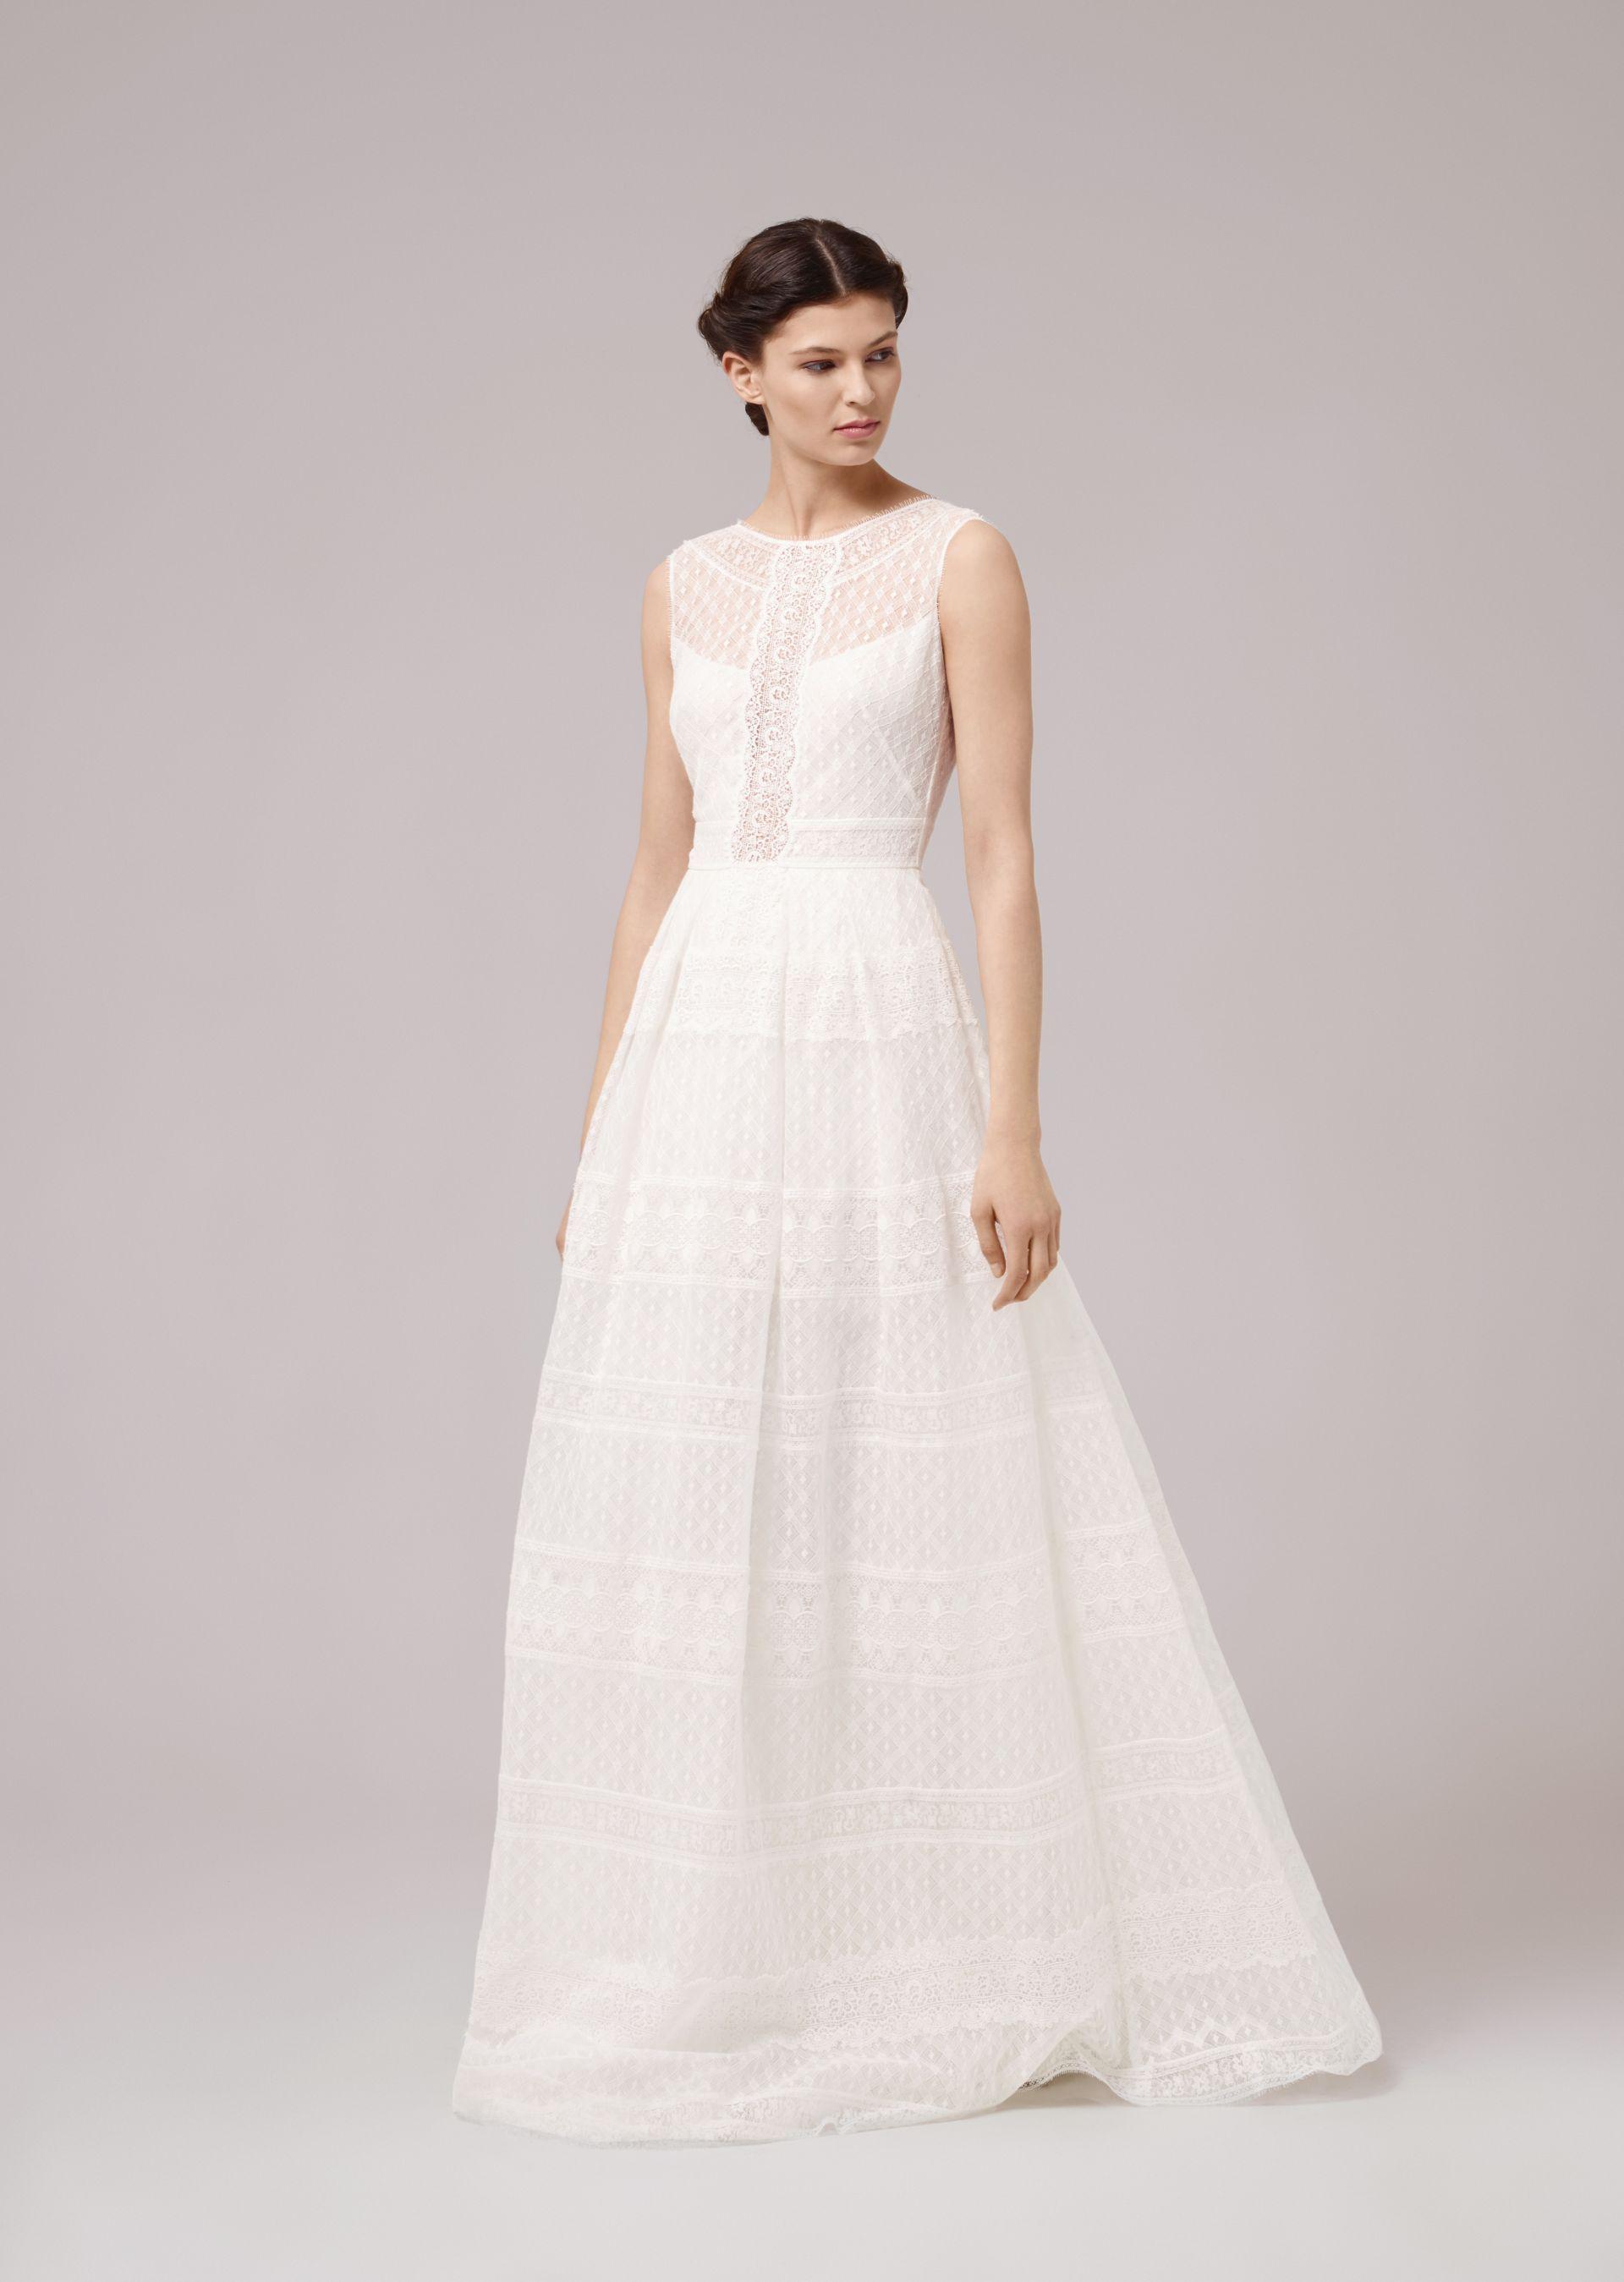 Rebekah Suknie Slubne Anna Kara Alya Wedding Dress Wedding